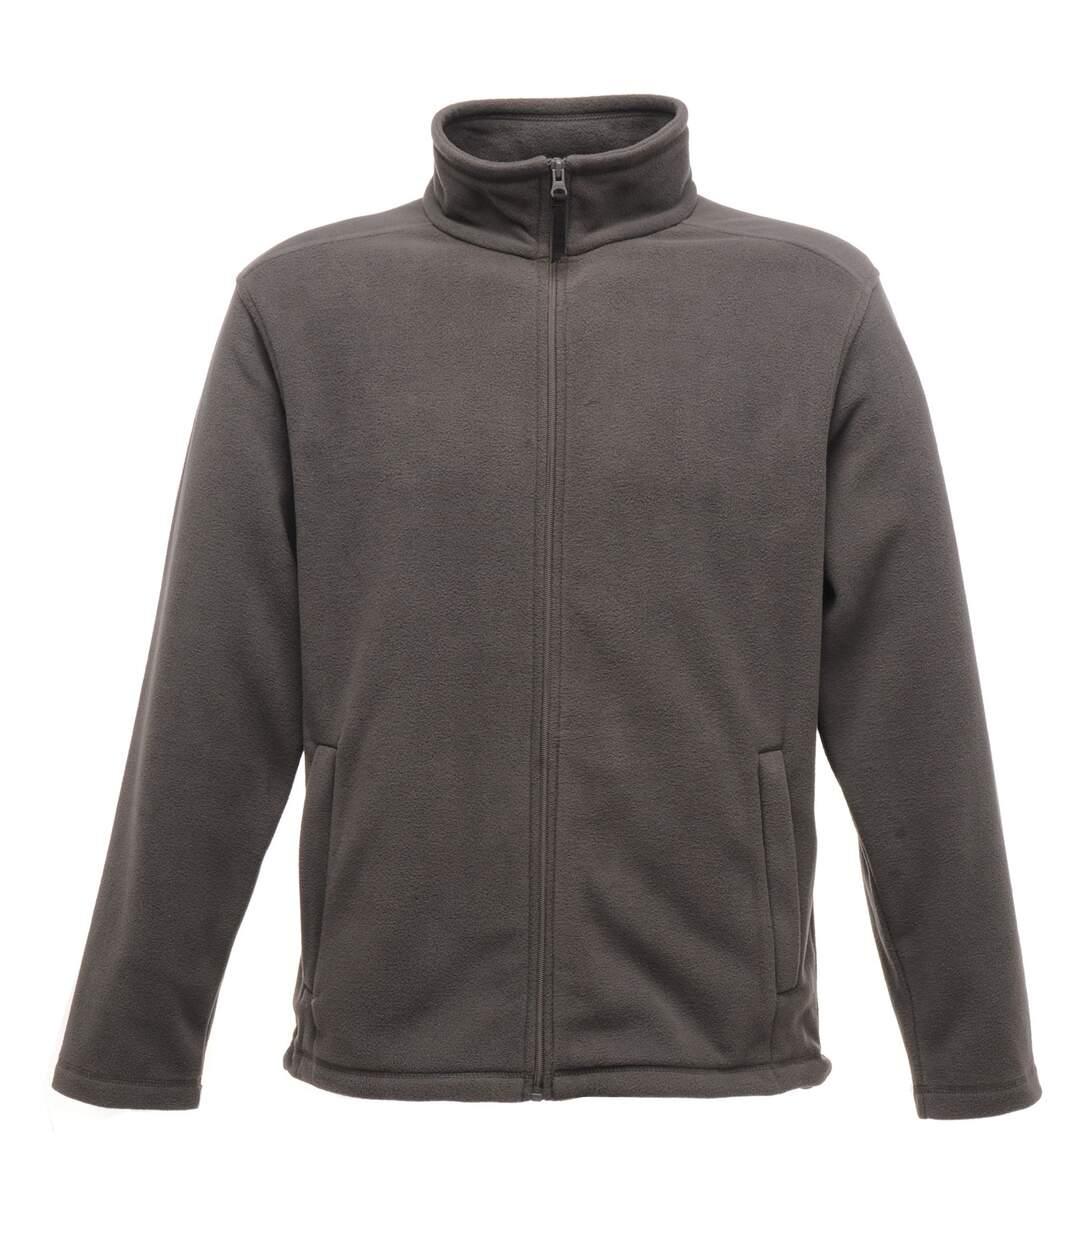 Regatta Mens Plain Micro Fleece Full Zip Jacket (Layer Lite) (Seal Grey) - UTBC2042